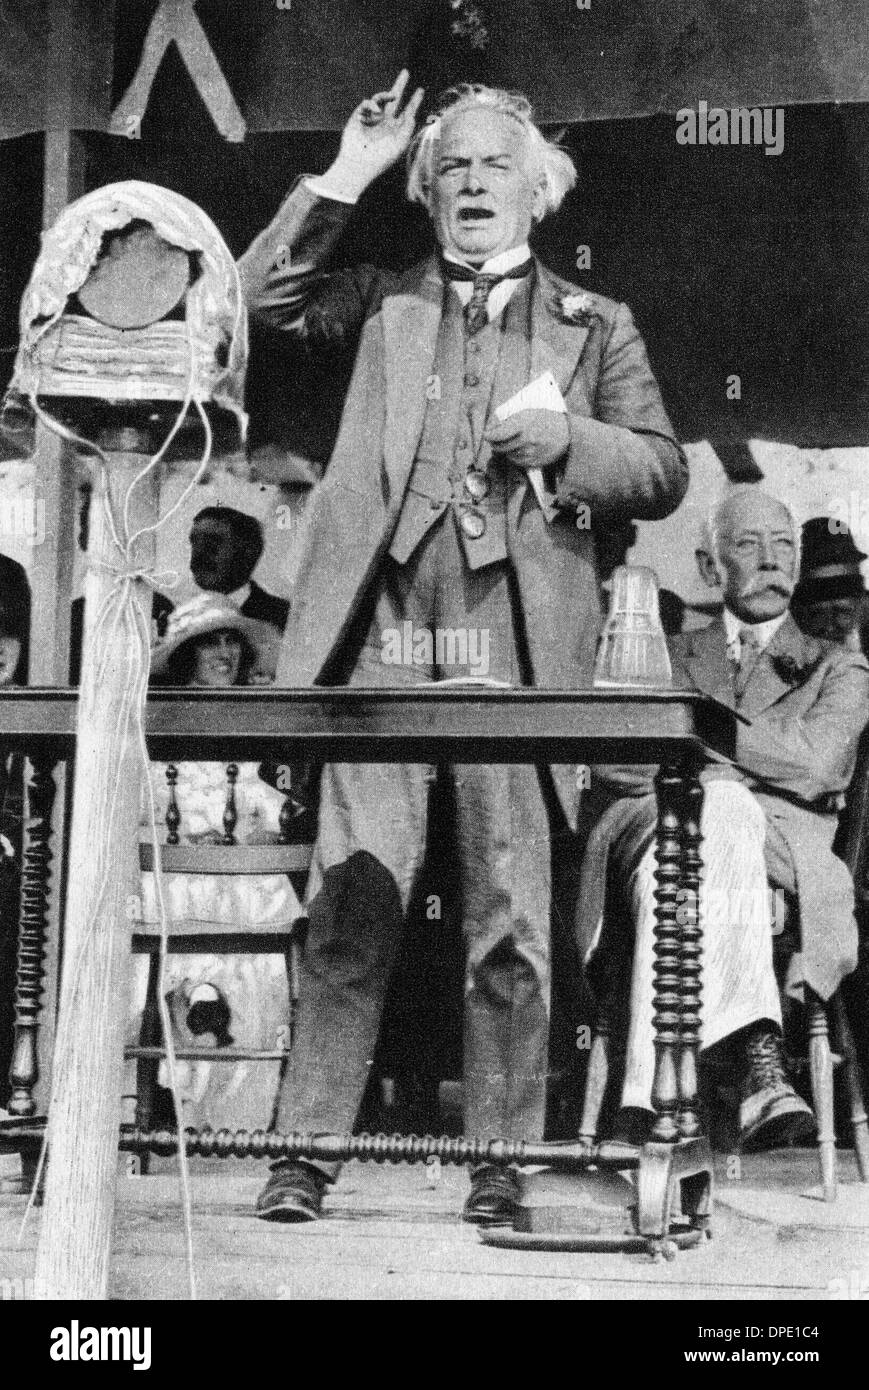 LLOYD GEORGE CIRCA 1900 - Stock Image